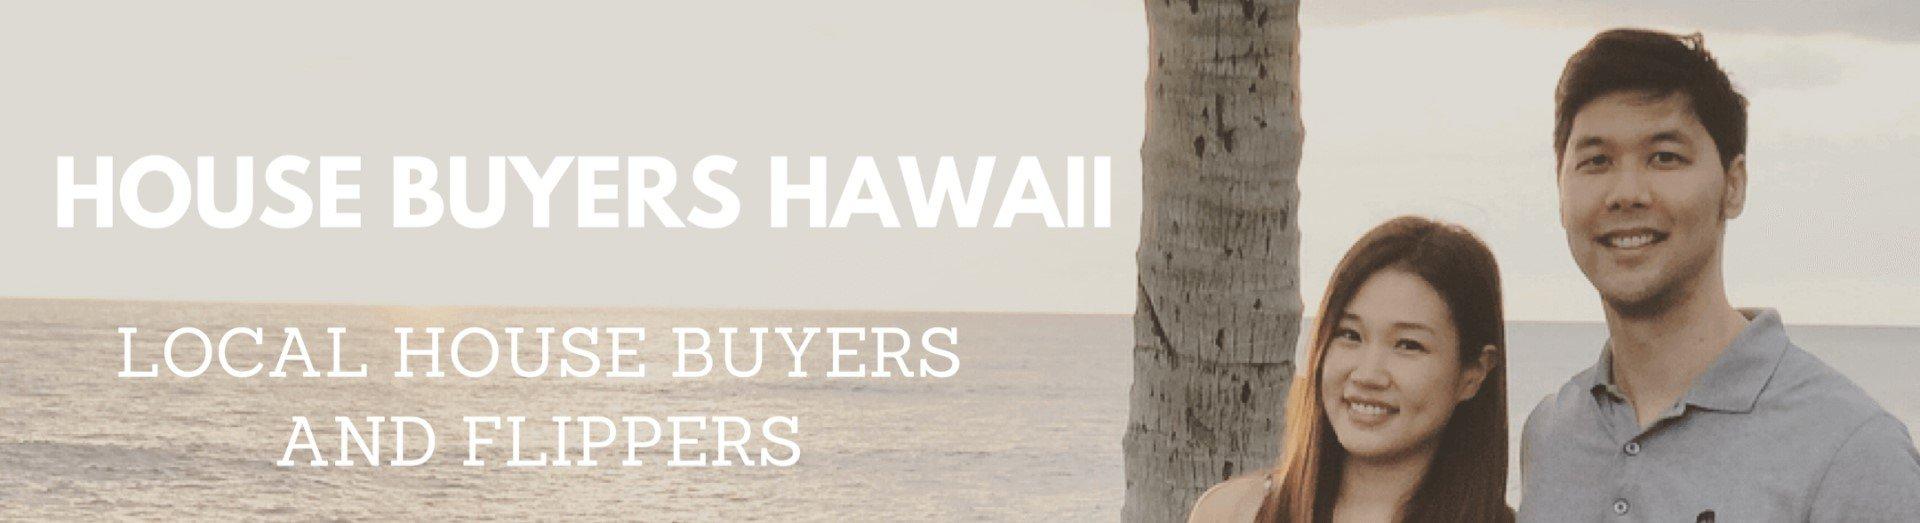 we buy houses Hawaii - team of Daniel and Christina